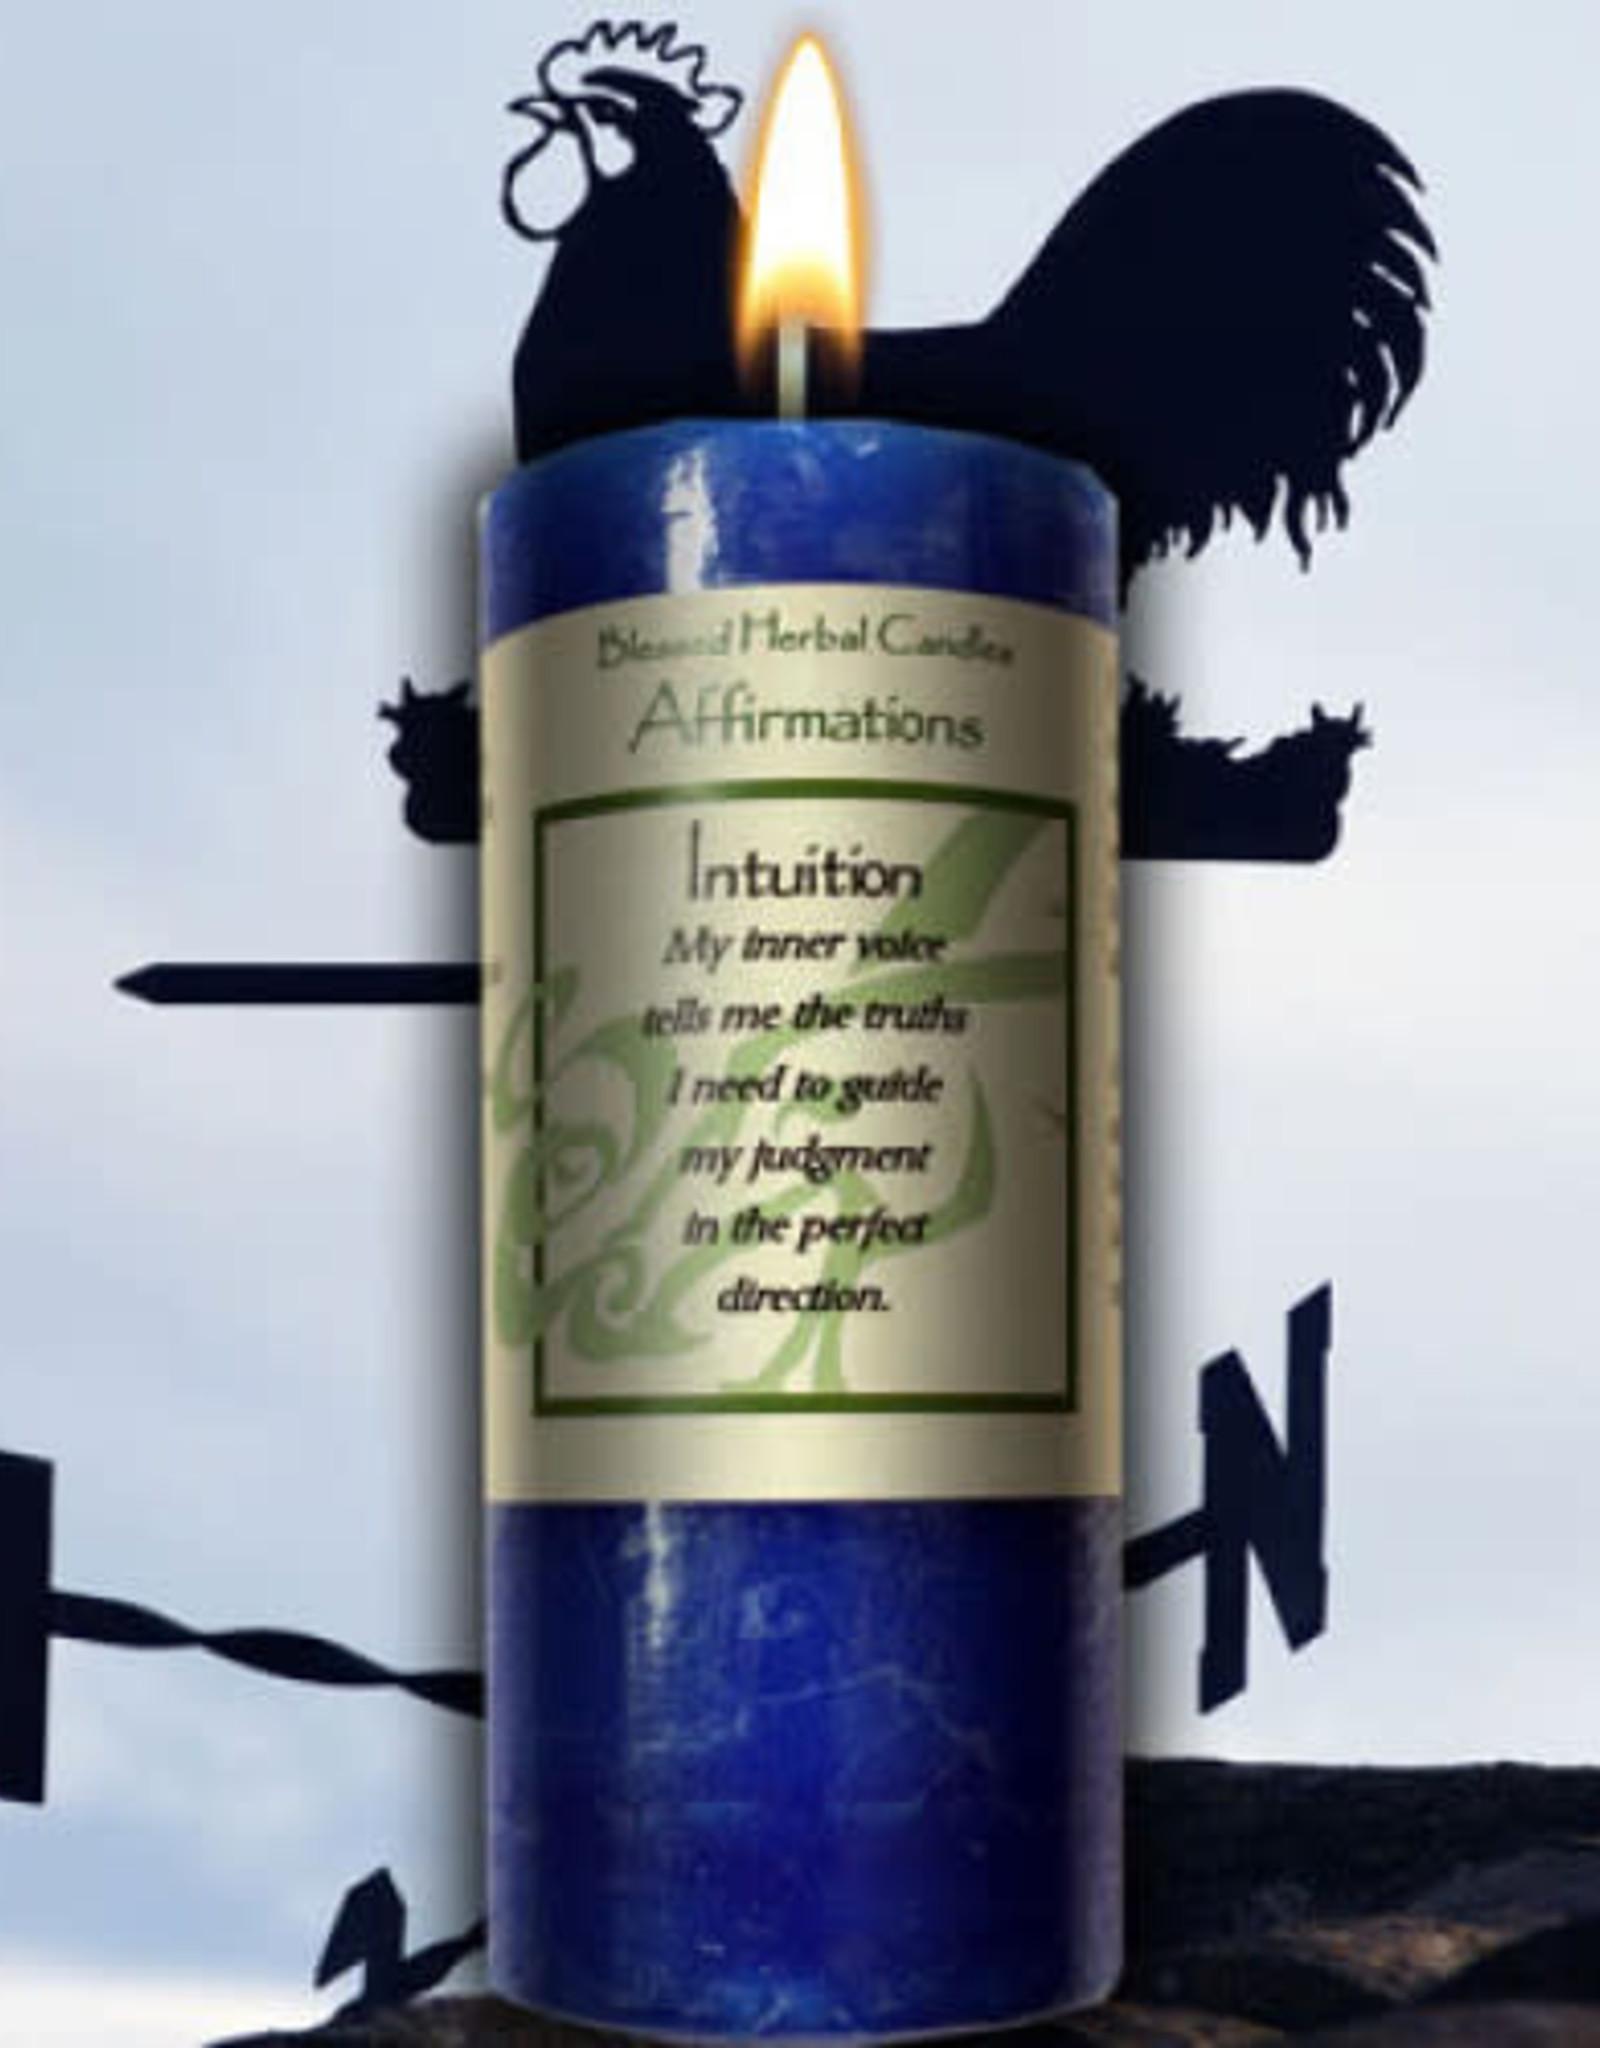 Affirmation Candles A-I